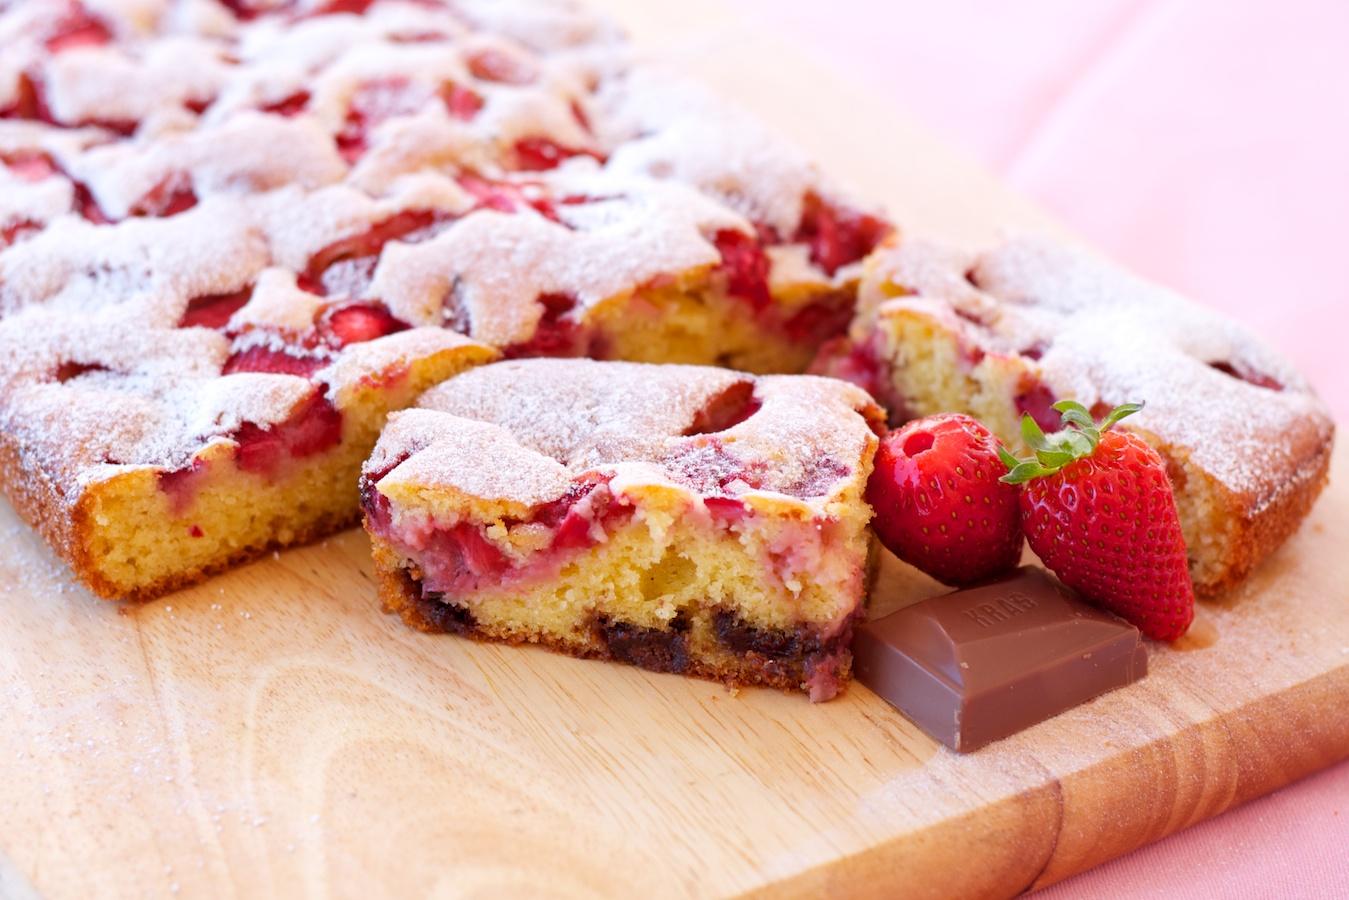 Brzi biskvit kolač s jagodama i čokoladom 1